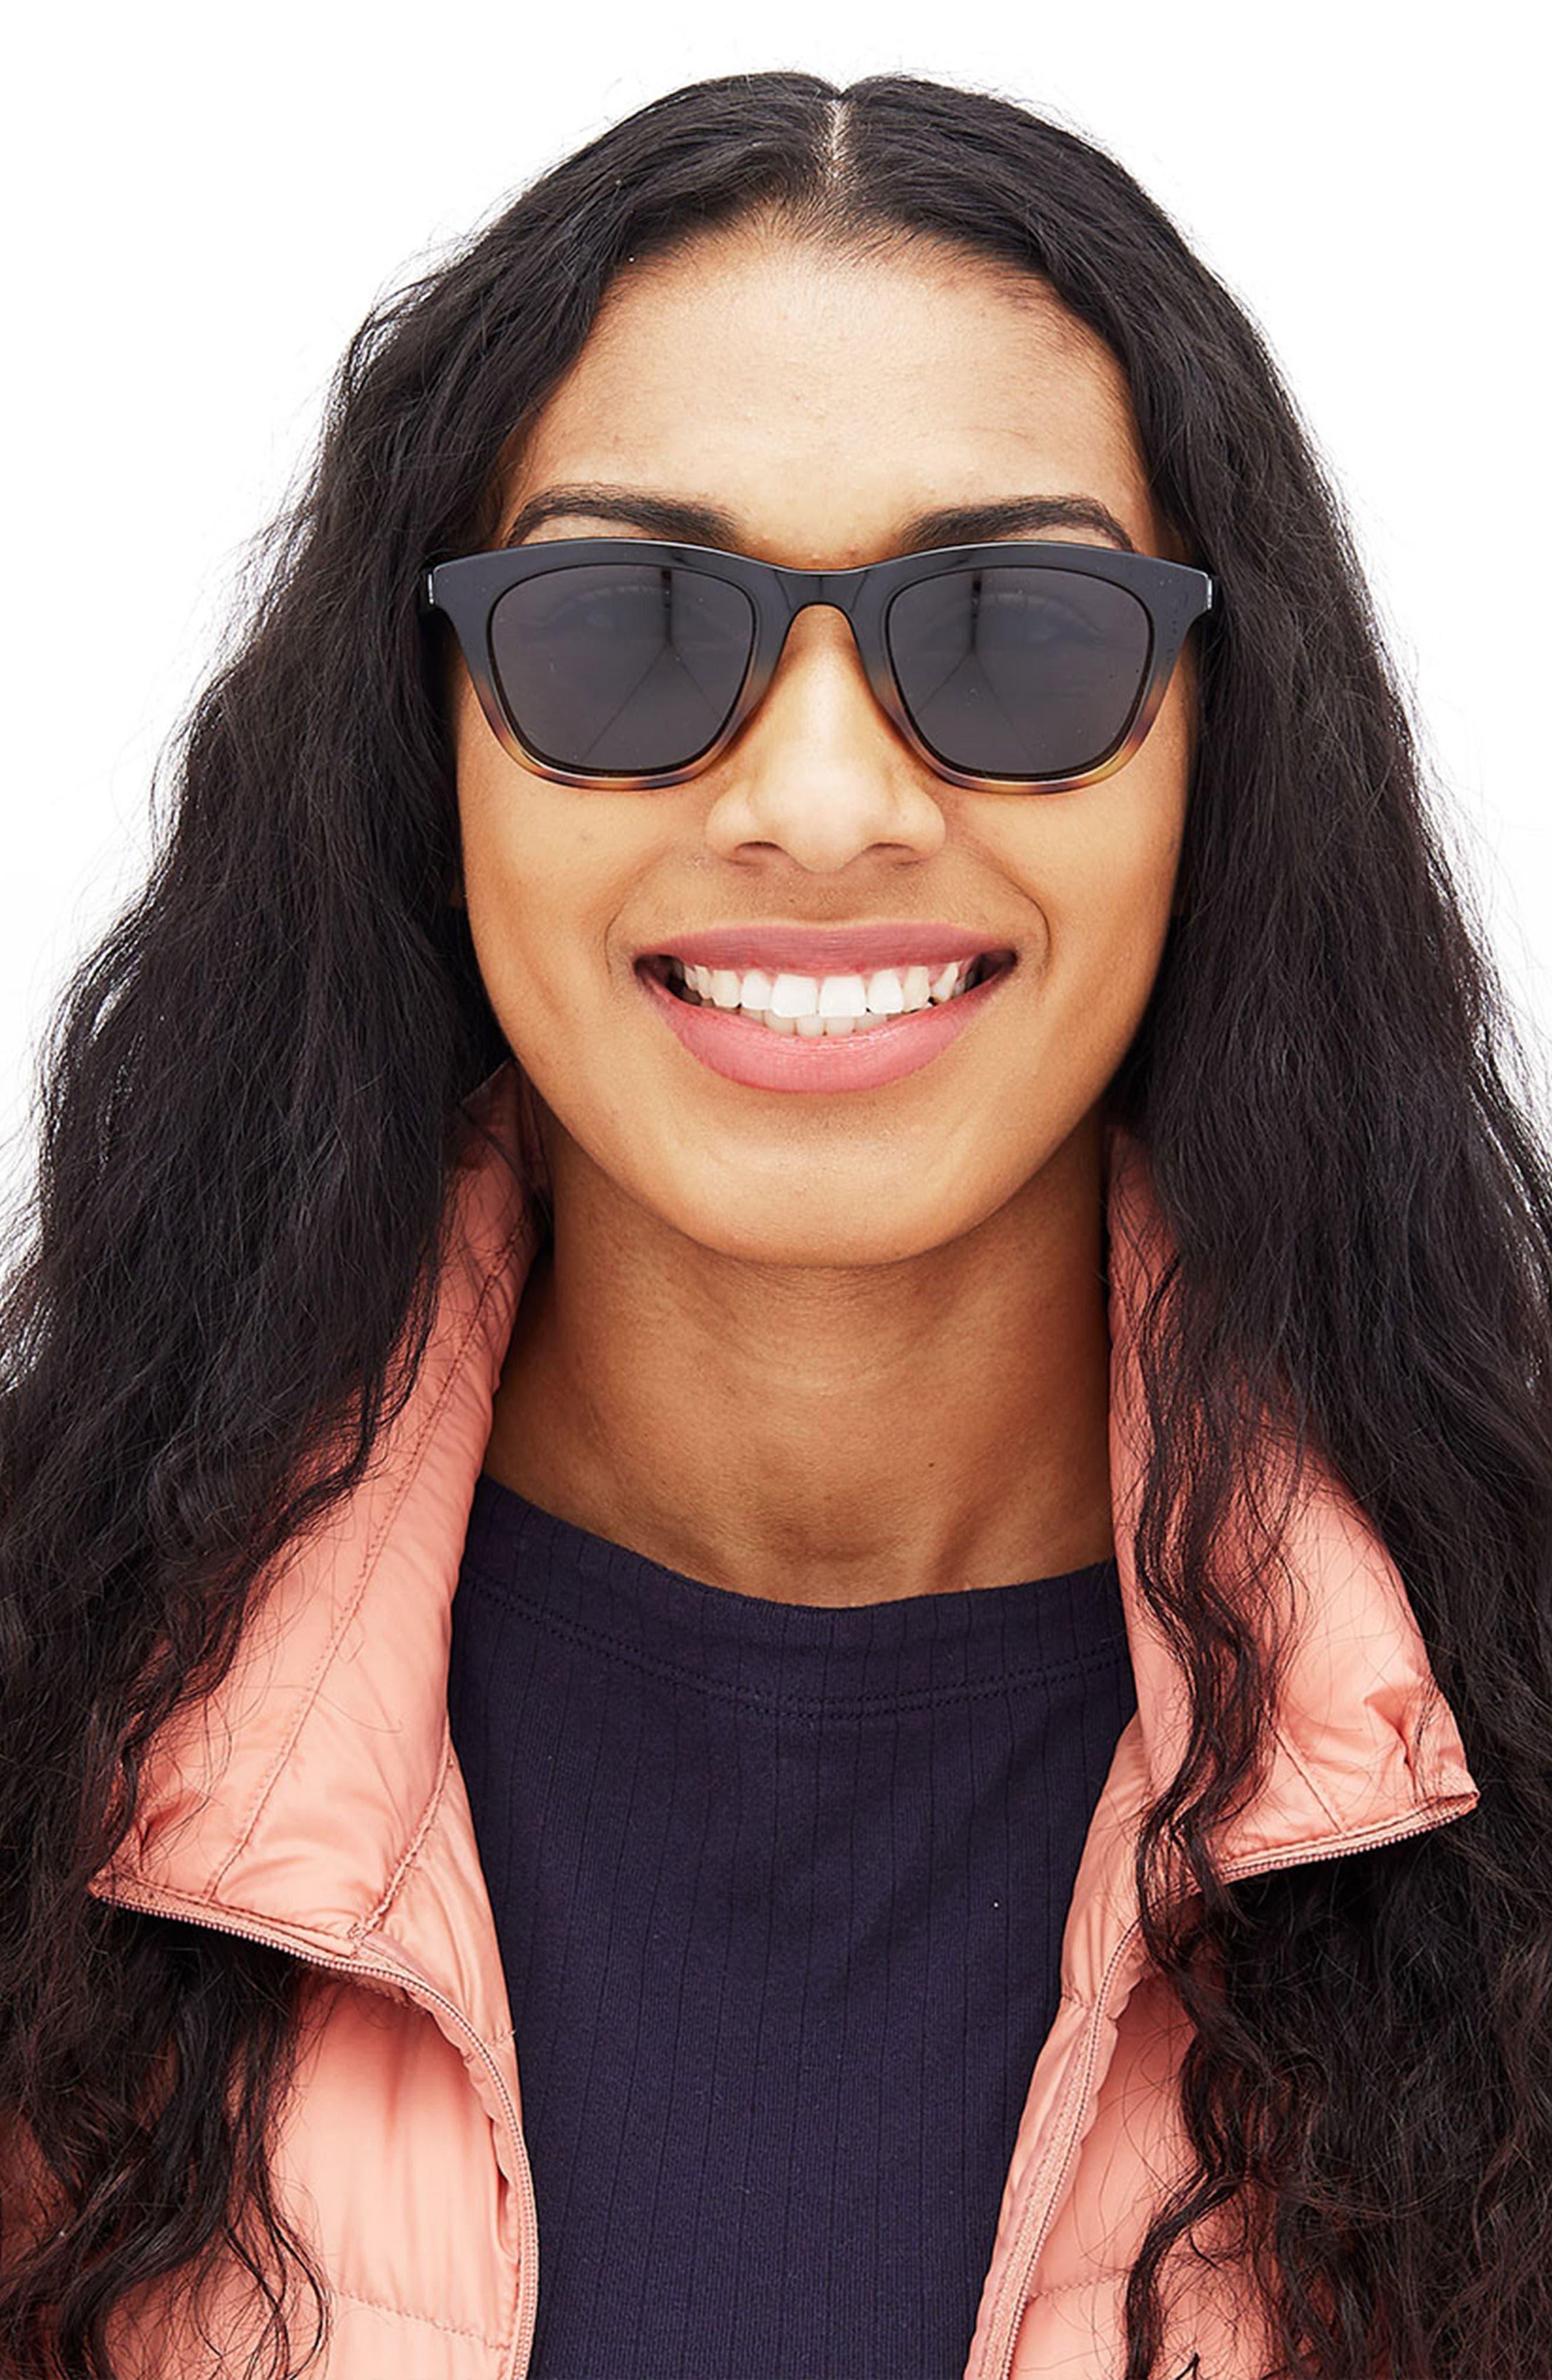 Manresa 49mm Polarized Sunglasses,                             Alternate thumbnail 3, color,                             BLACK TORTOISE SLATE